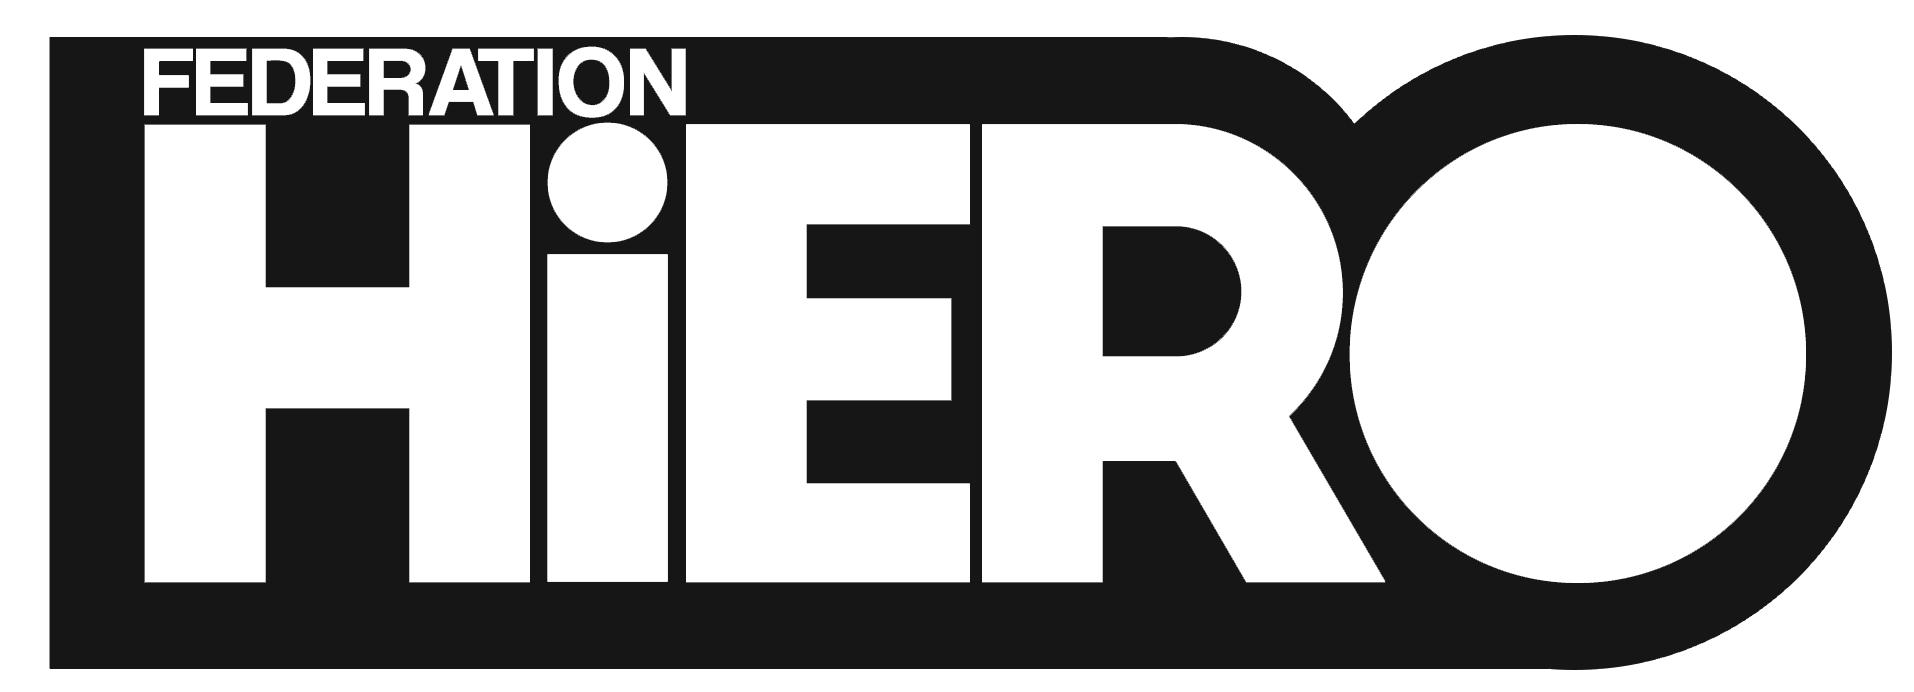 logo-2017-hiero